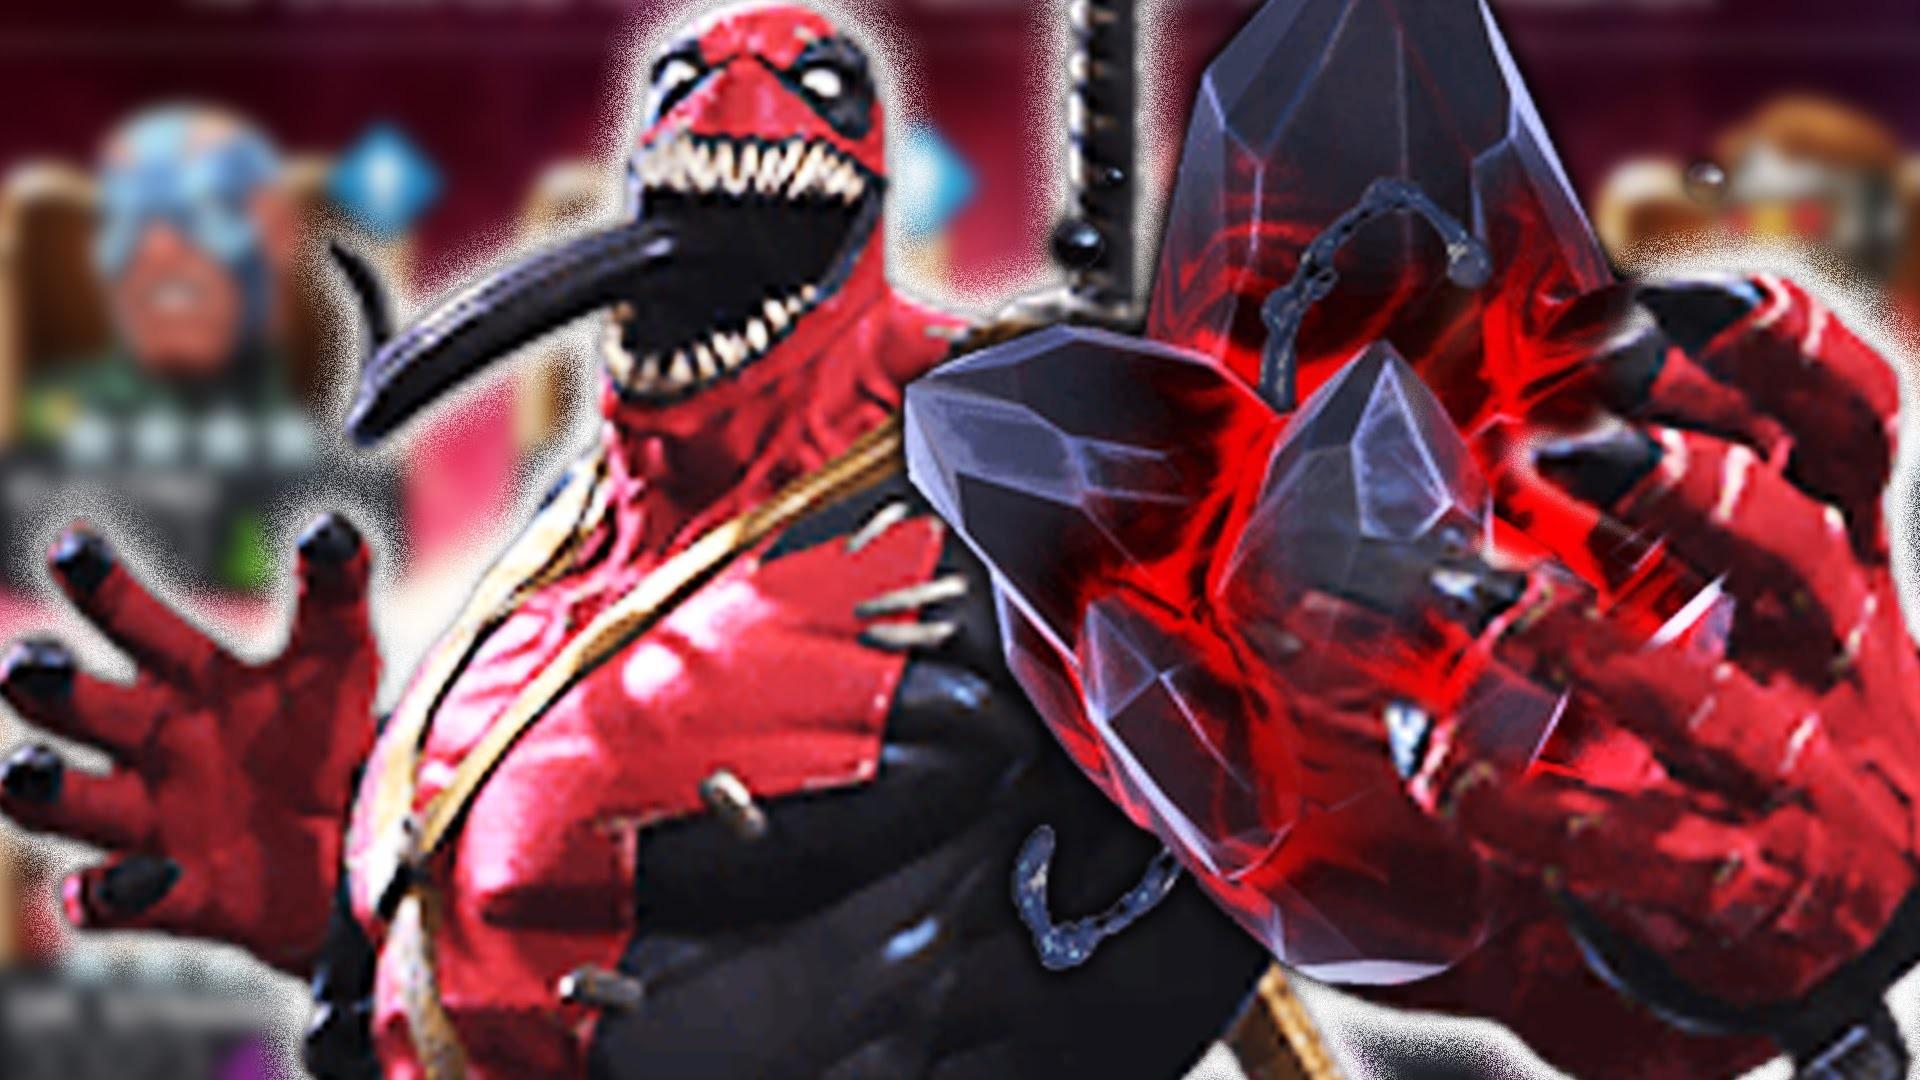 Deadpool And Spiderman HD desktop wallpaper High